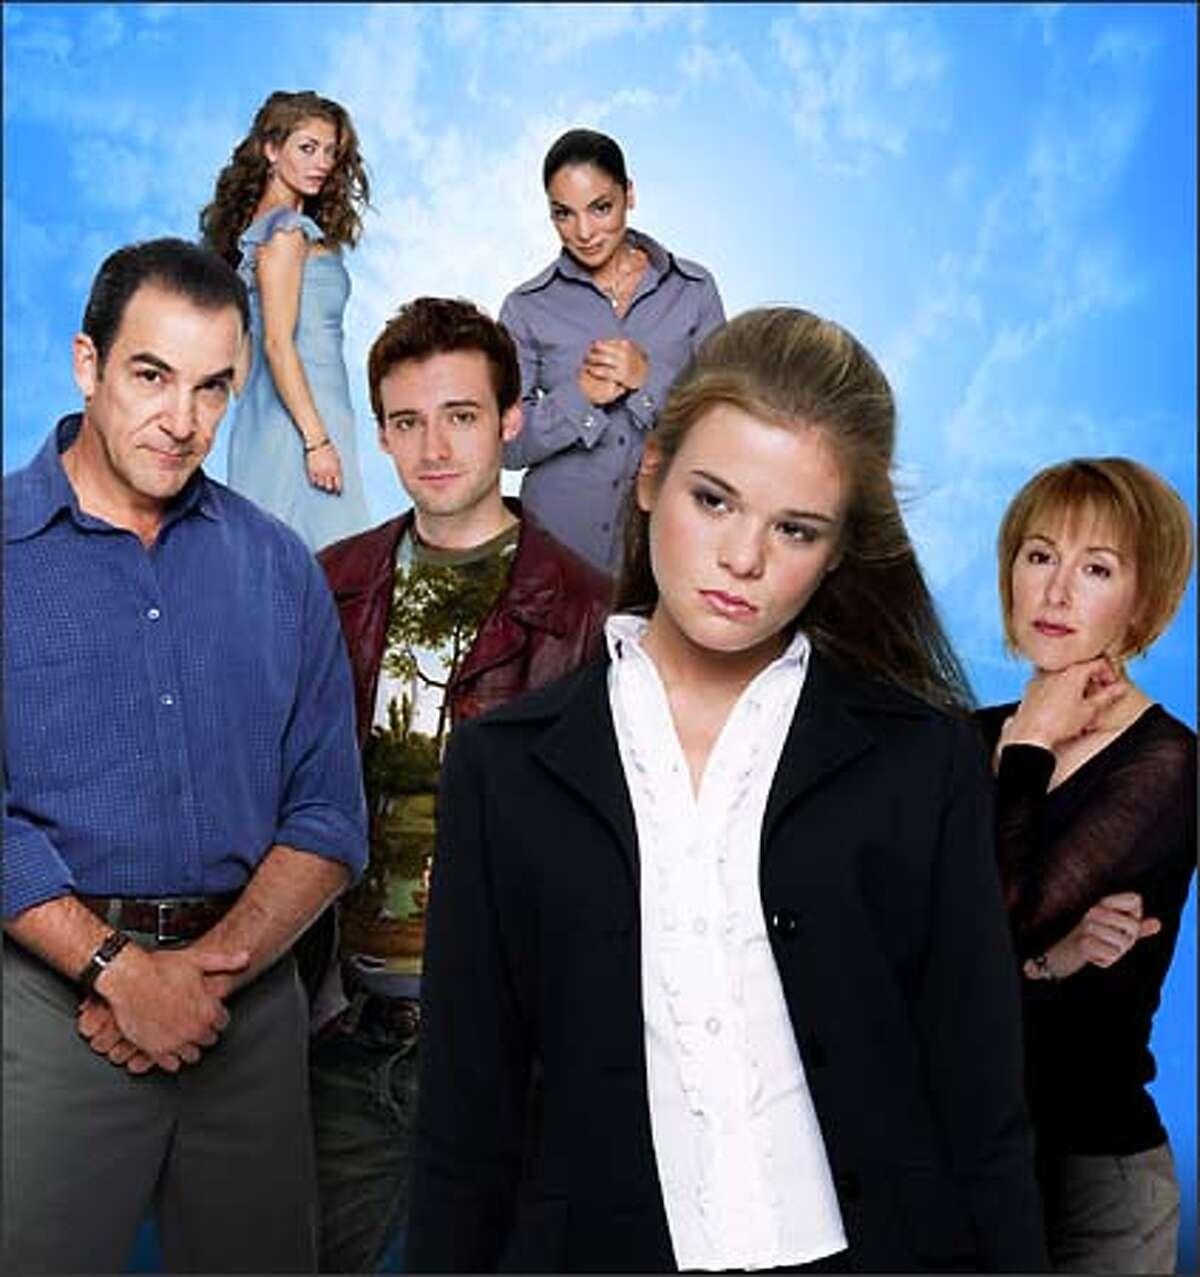 """Dead Like Me"" stars (clockwise from lower left) Mandy Patinkin as Rube, Rebecca Gayheart as Betty, Jasmine Guy as Roxy, Cynthia Stevenson as Joy Lass, Ellen Muth as George and Callum Blue as Mason."